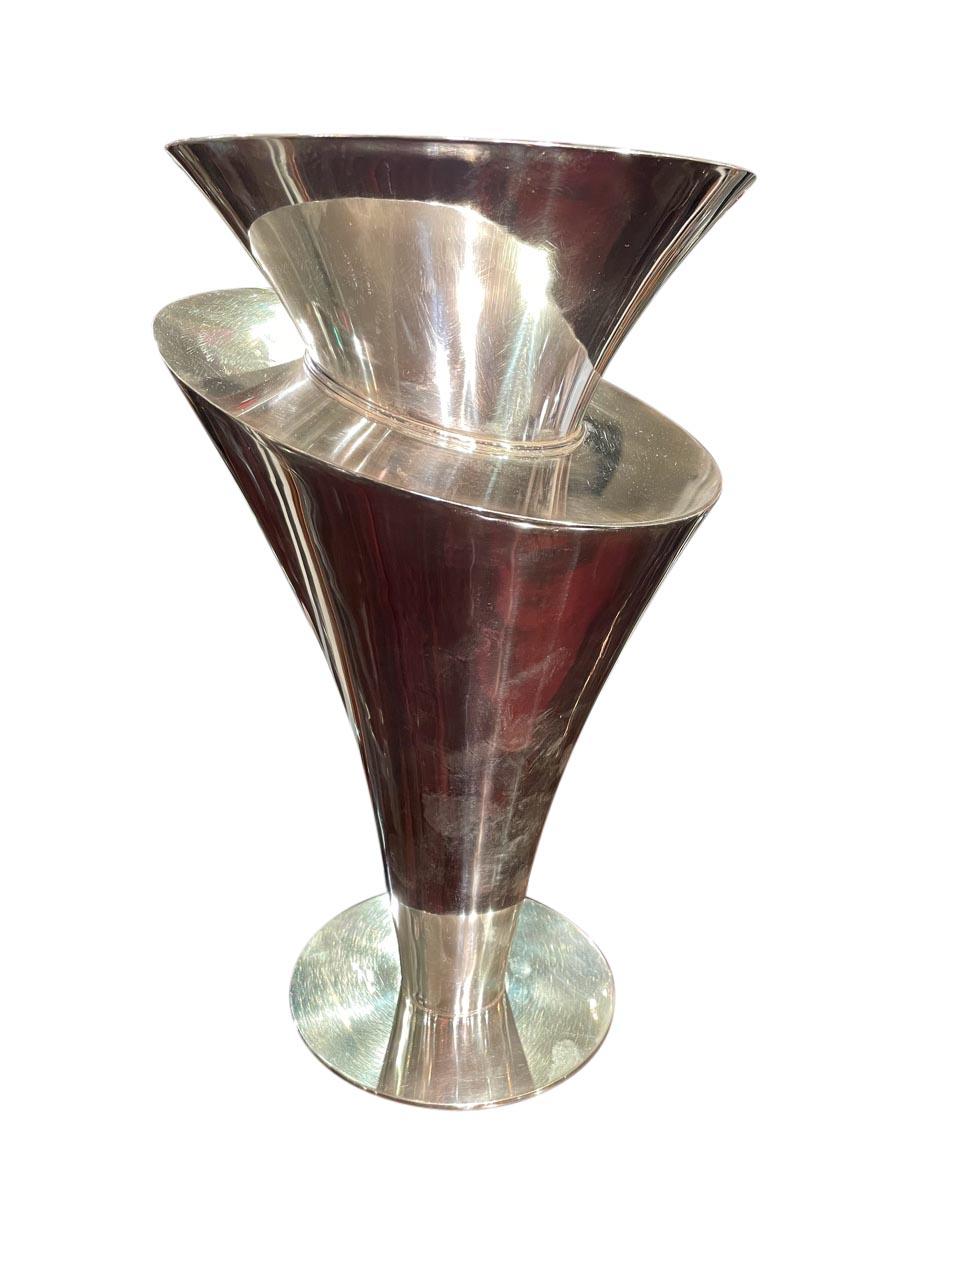 French Art Deco Modernist Vase by Maison Desny